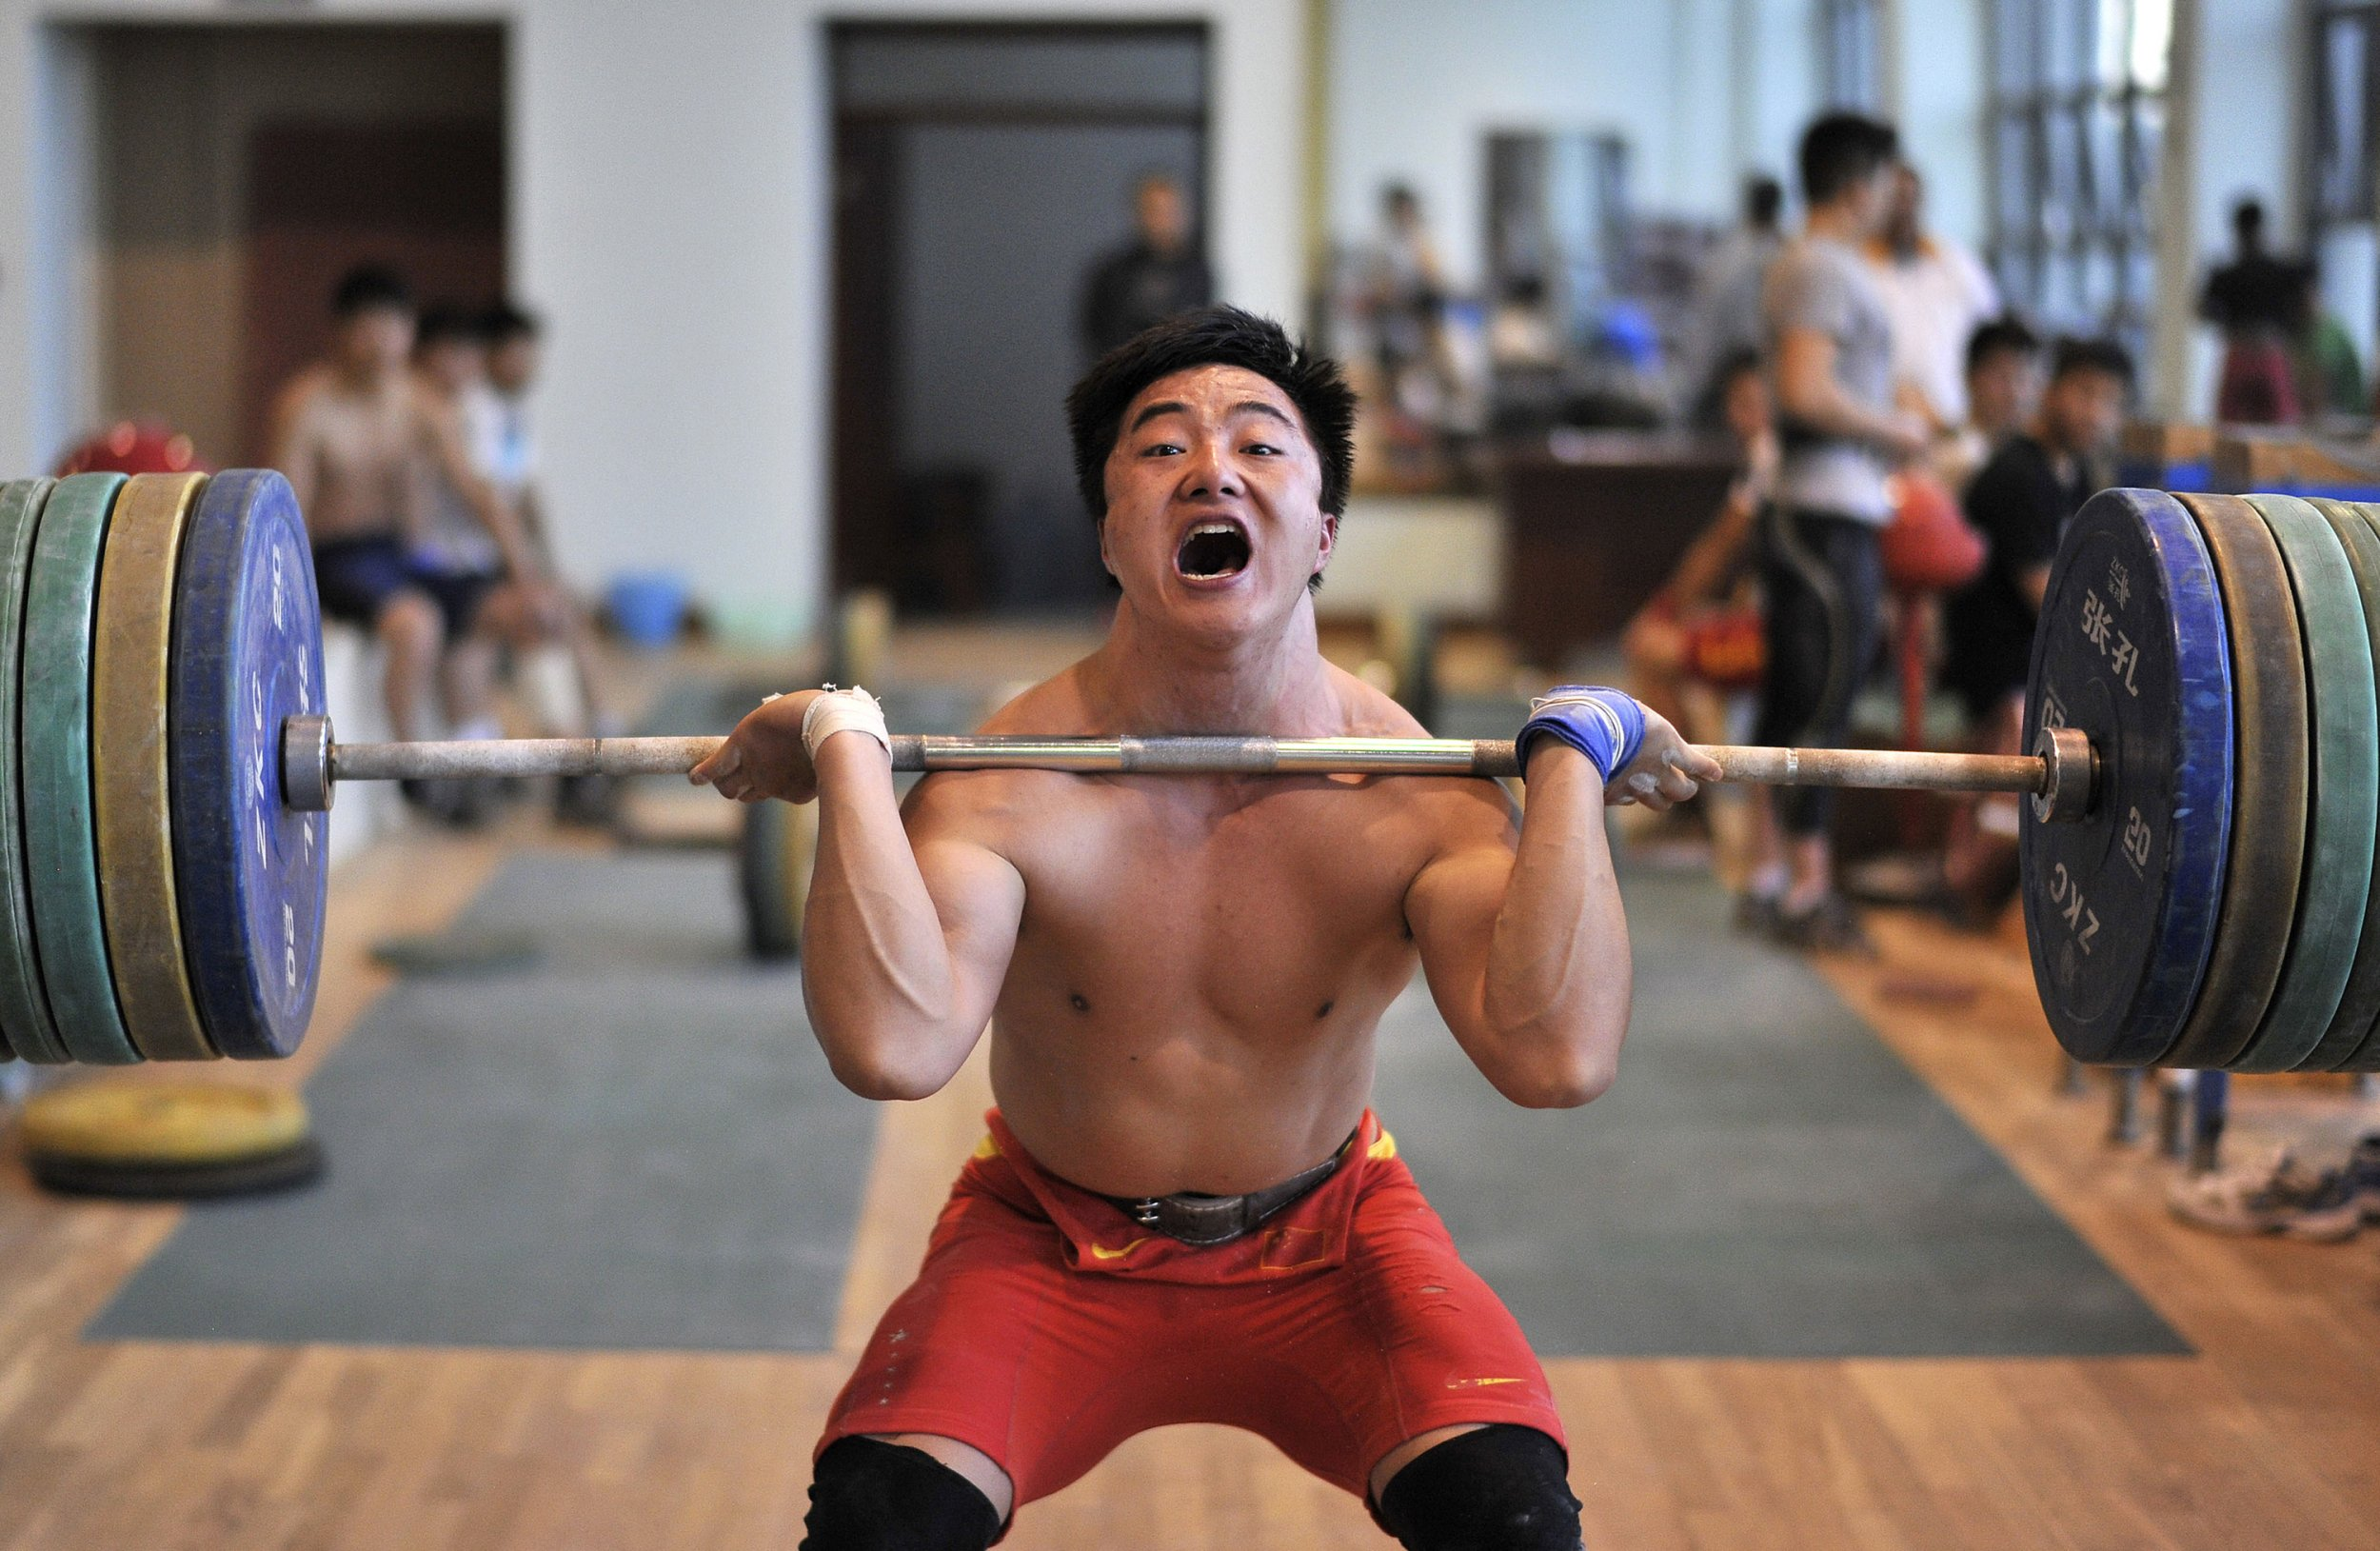 123_lifting